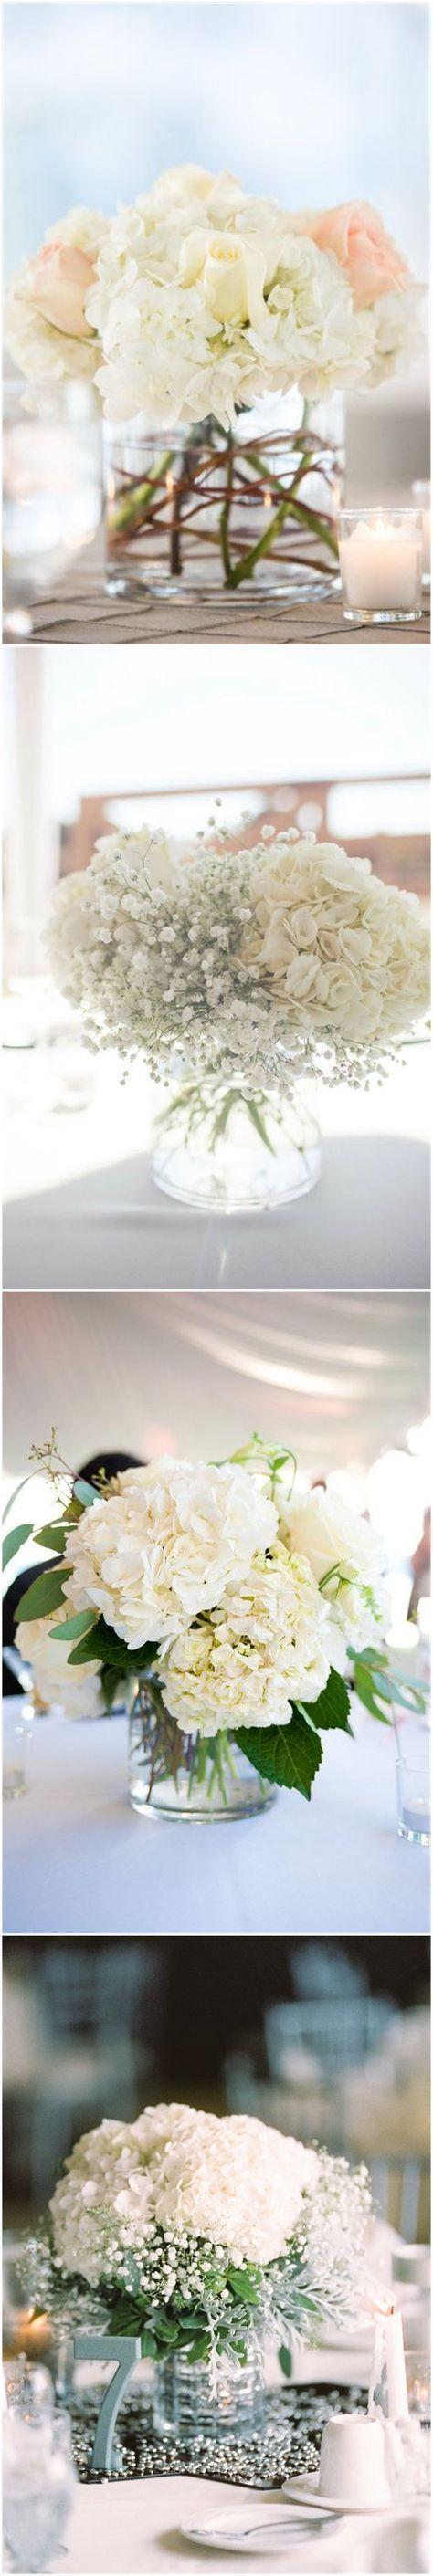 creative wording for rehearsal dinner invitations%0A    Simple Yet Rustic DIY Hydrangea Wedding Centerpieces Ideas